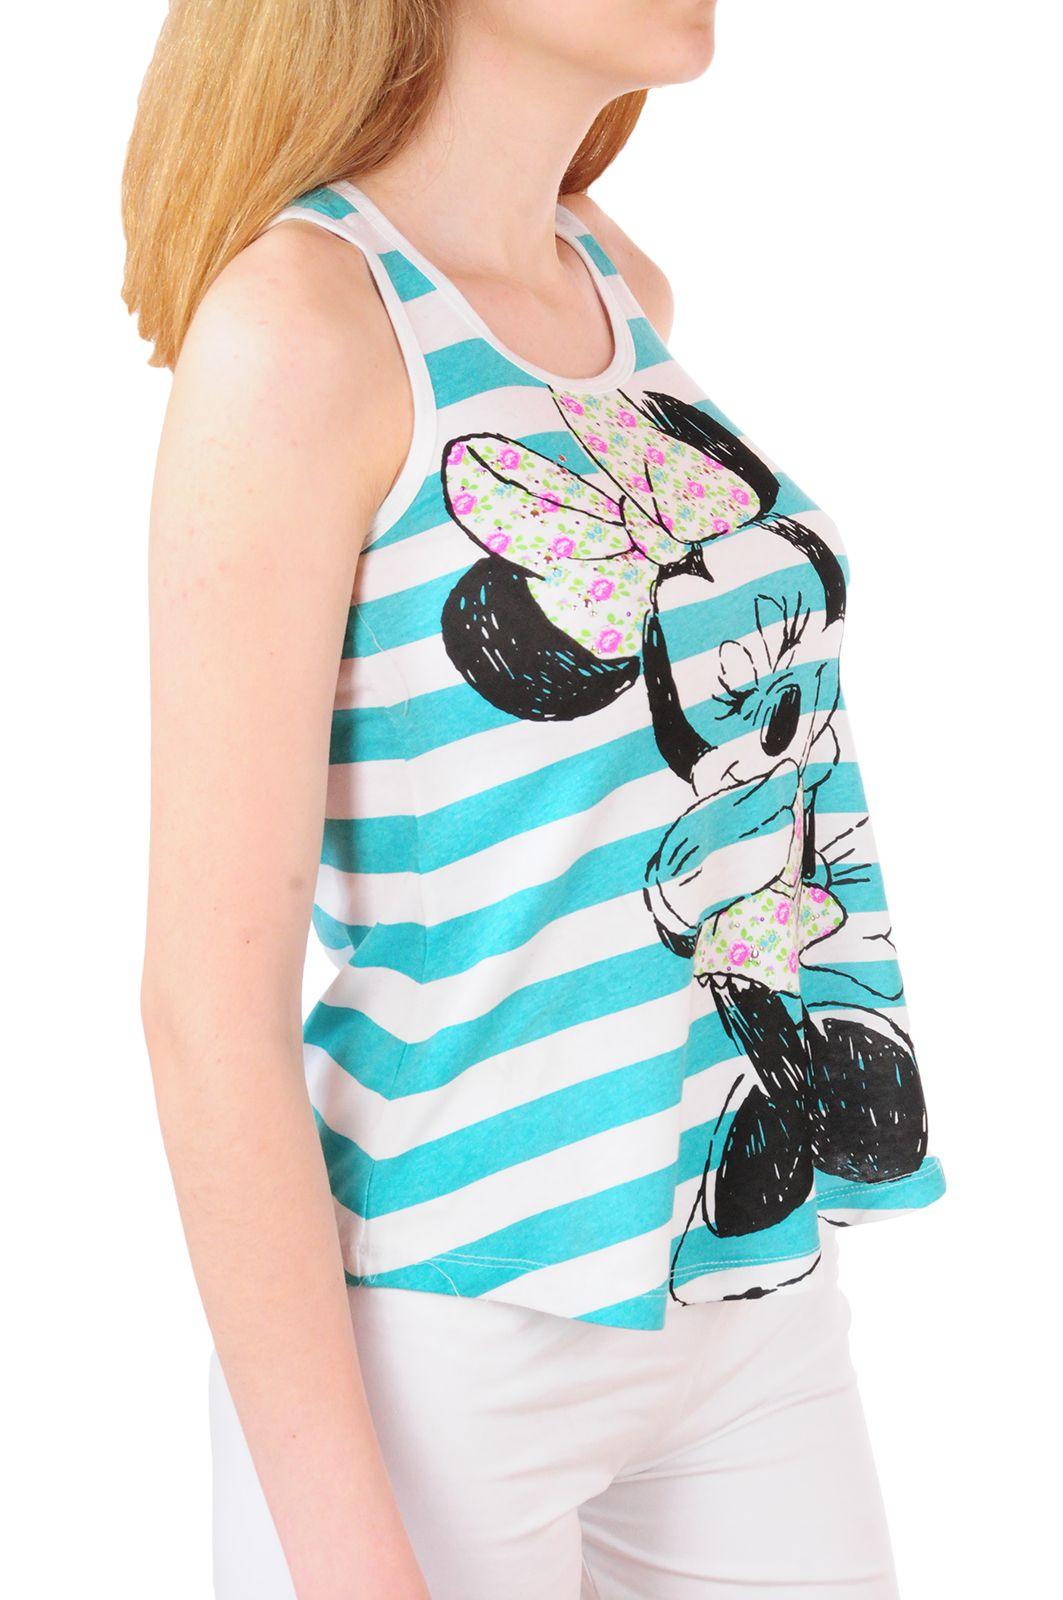 Забавная майка Disney Store для девушек - вид сбоку